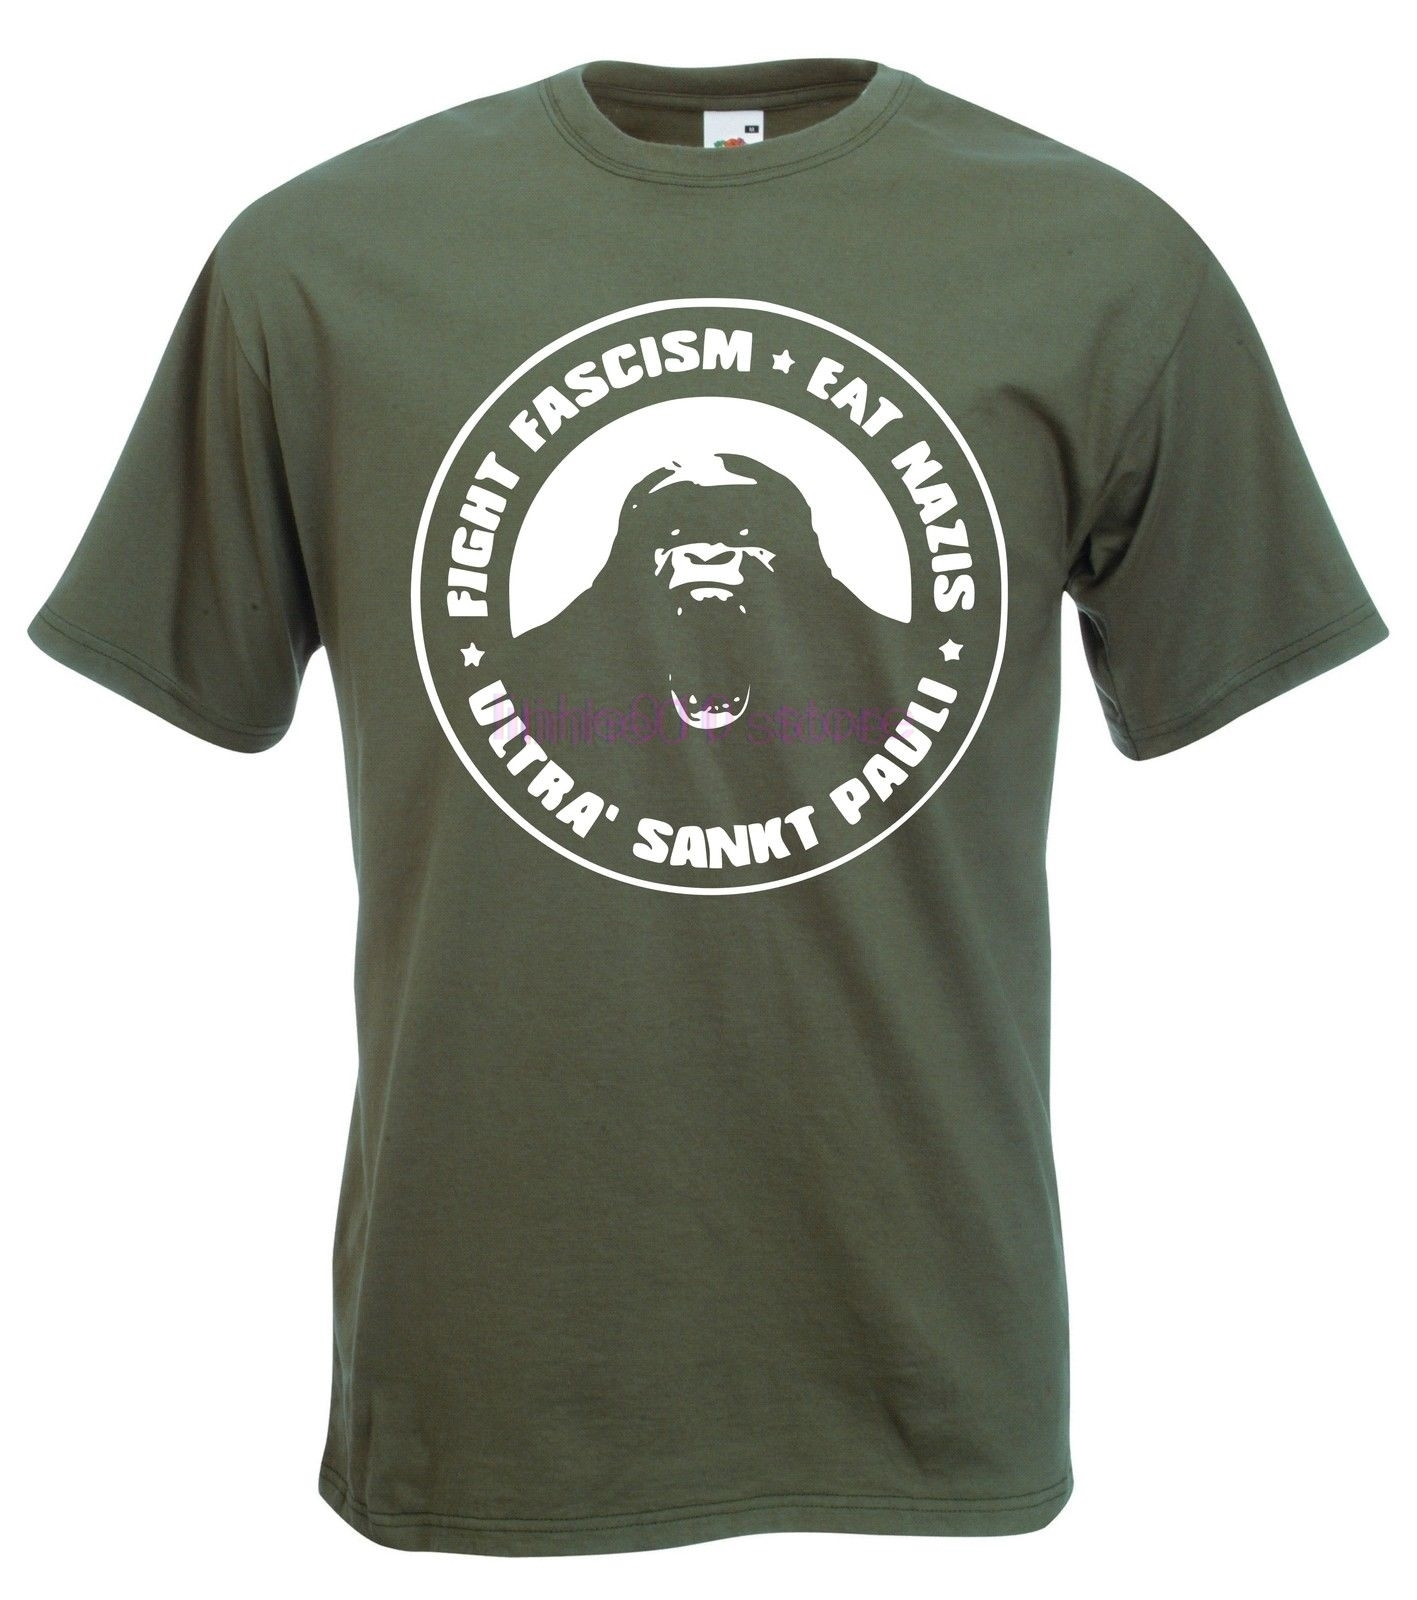 Negative Approach v12 T-shirt hardcore punk all sizes S-5XL